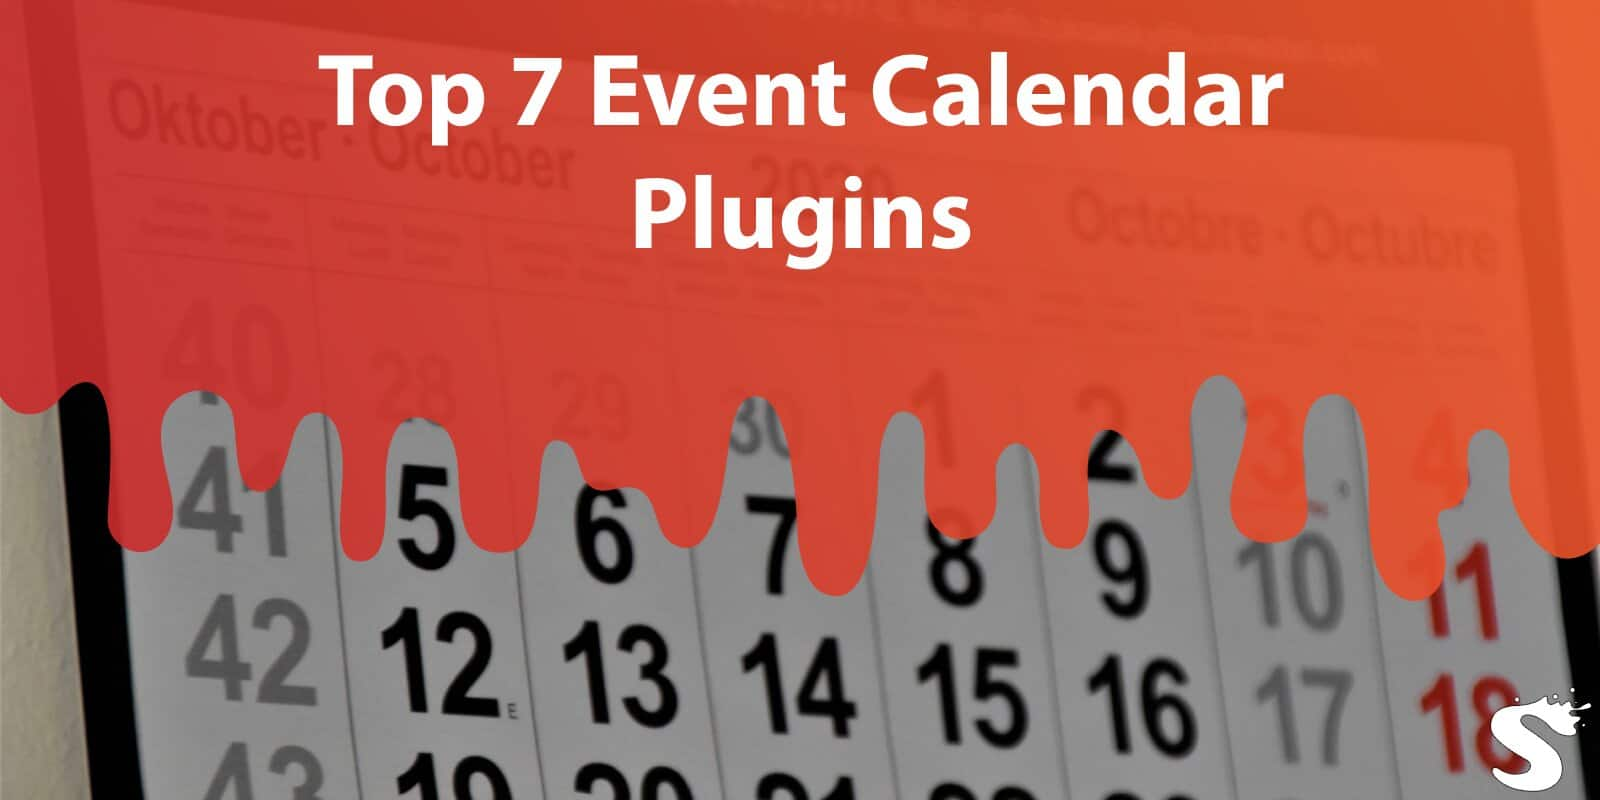 Top 7 Event Calendar Plugins